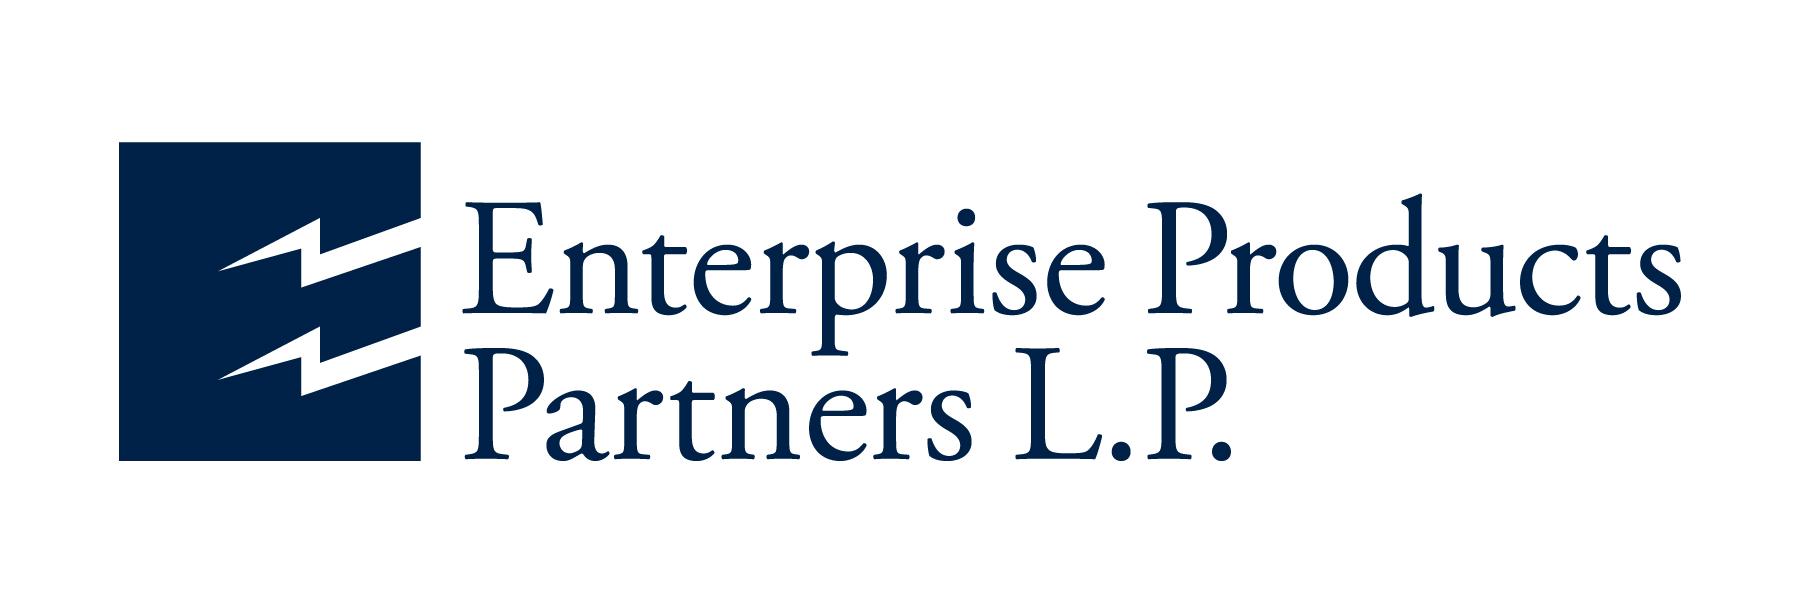 Enterprise Products Partners logo.jpg